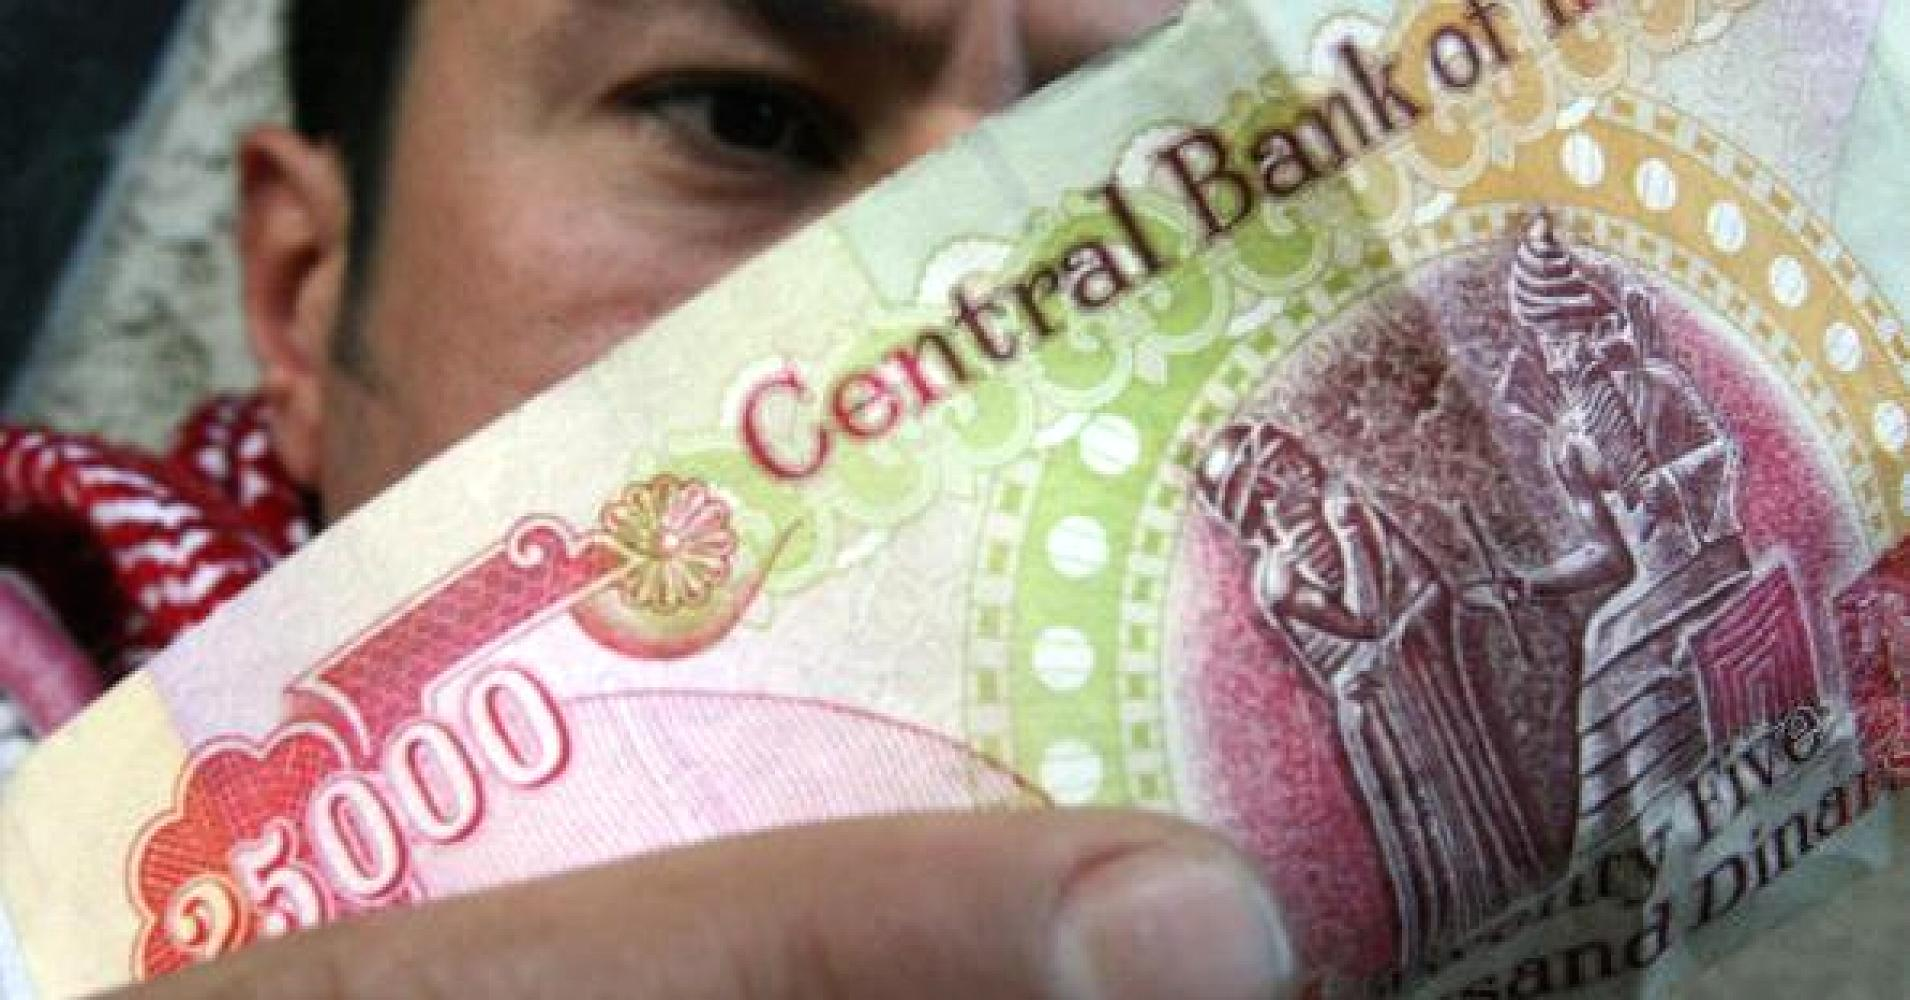 Financial Impasse Between Kurdish and Iraqi Governments, Financial Impasse Between Kurdish and Iraqi Governments